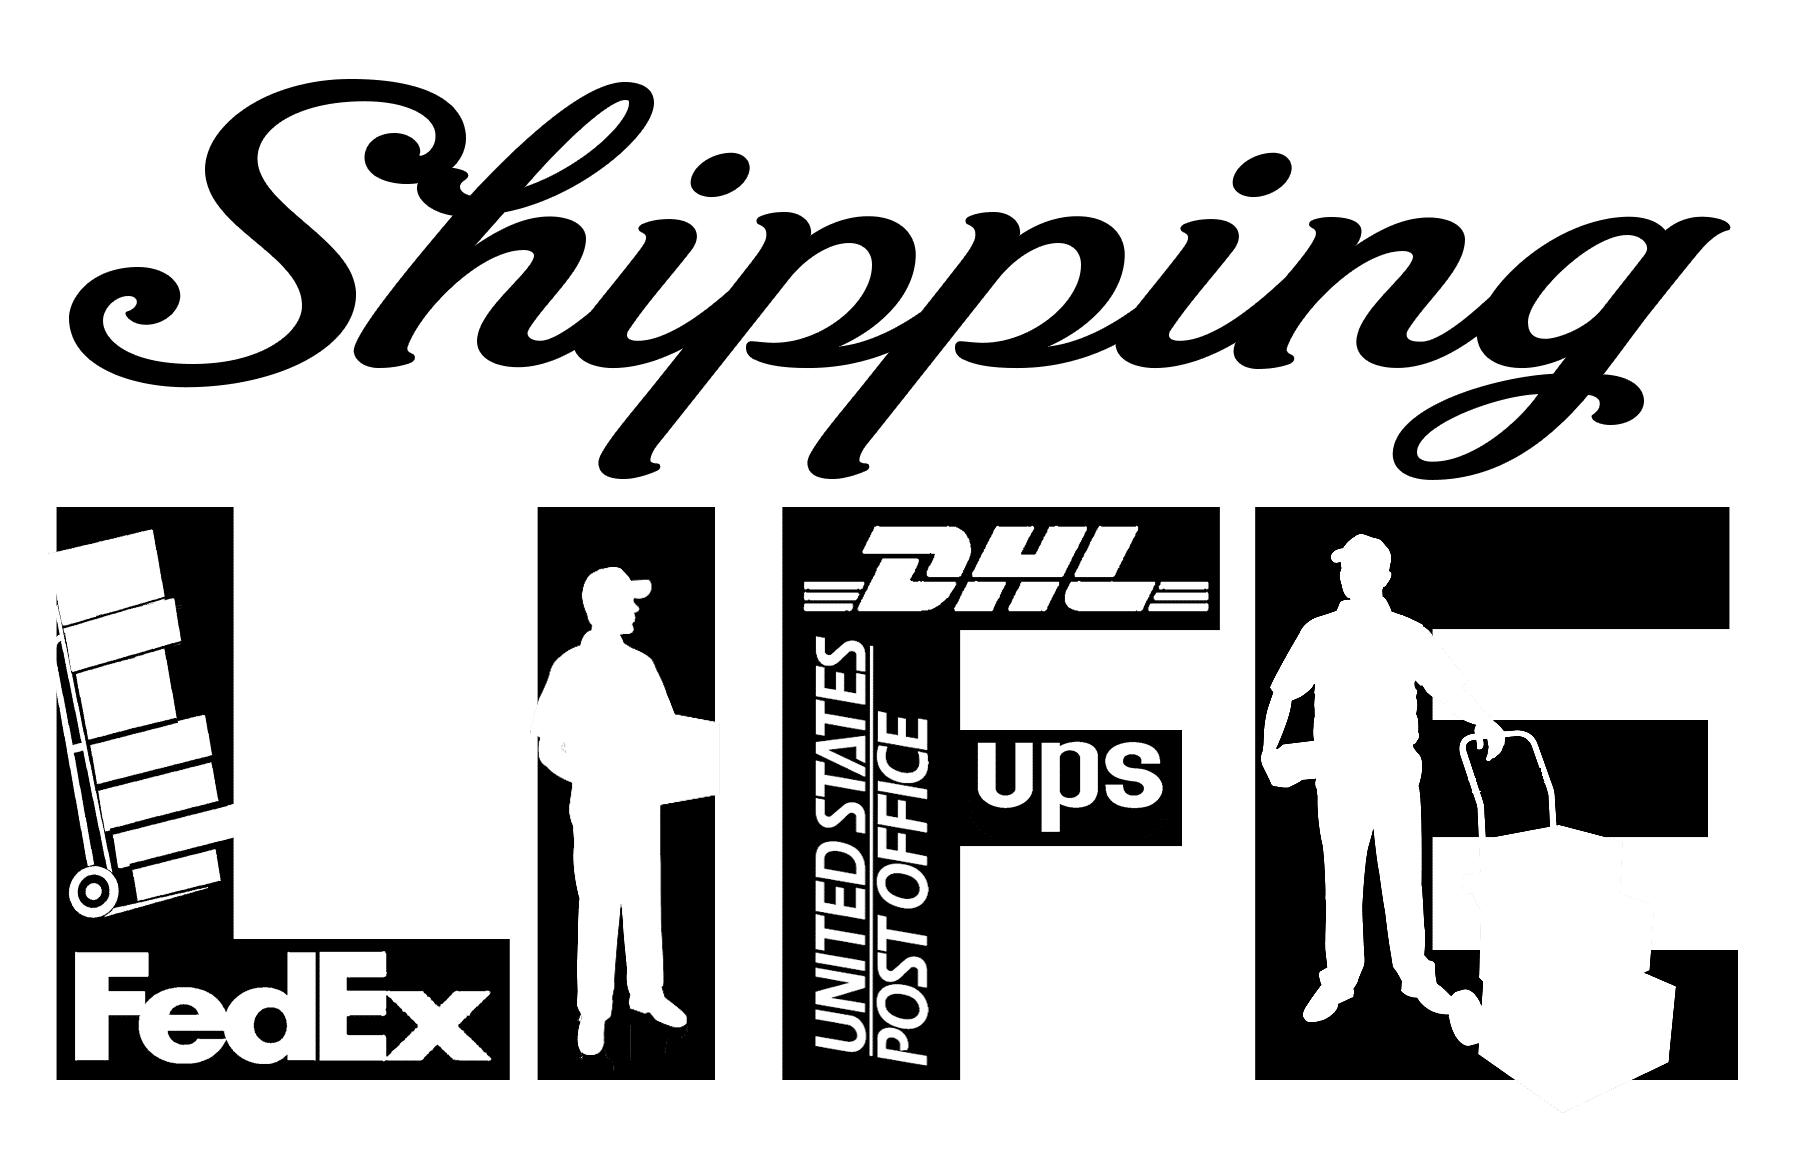 Free Shipping Life SVG File